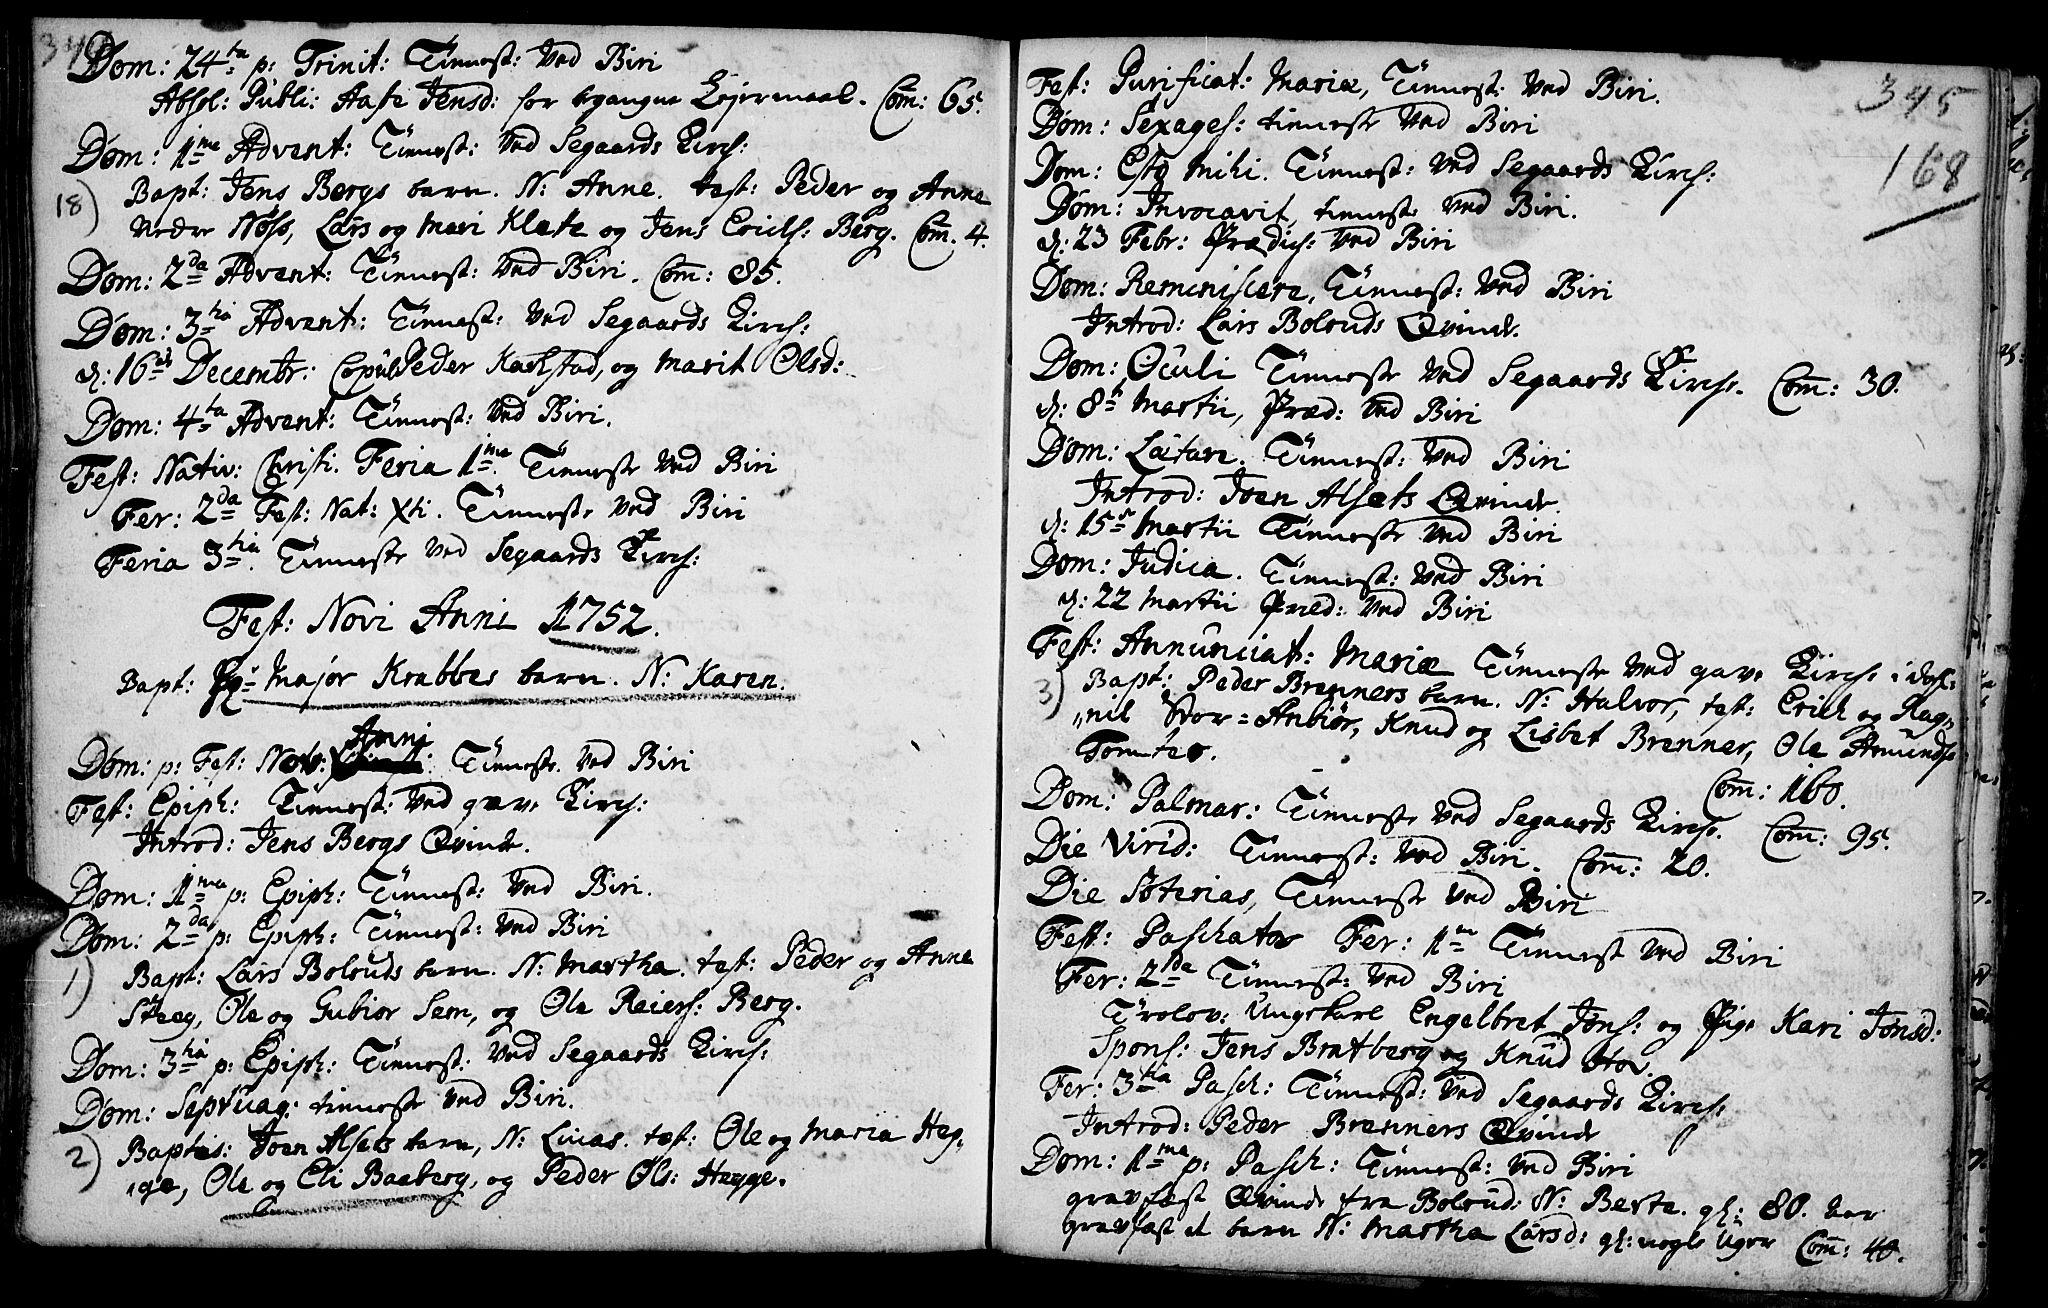 SAH, Biri prestekontor, Ministerialbok nr. 1, 1730-1754, s. 168